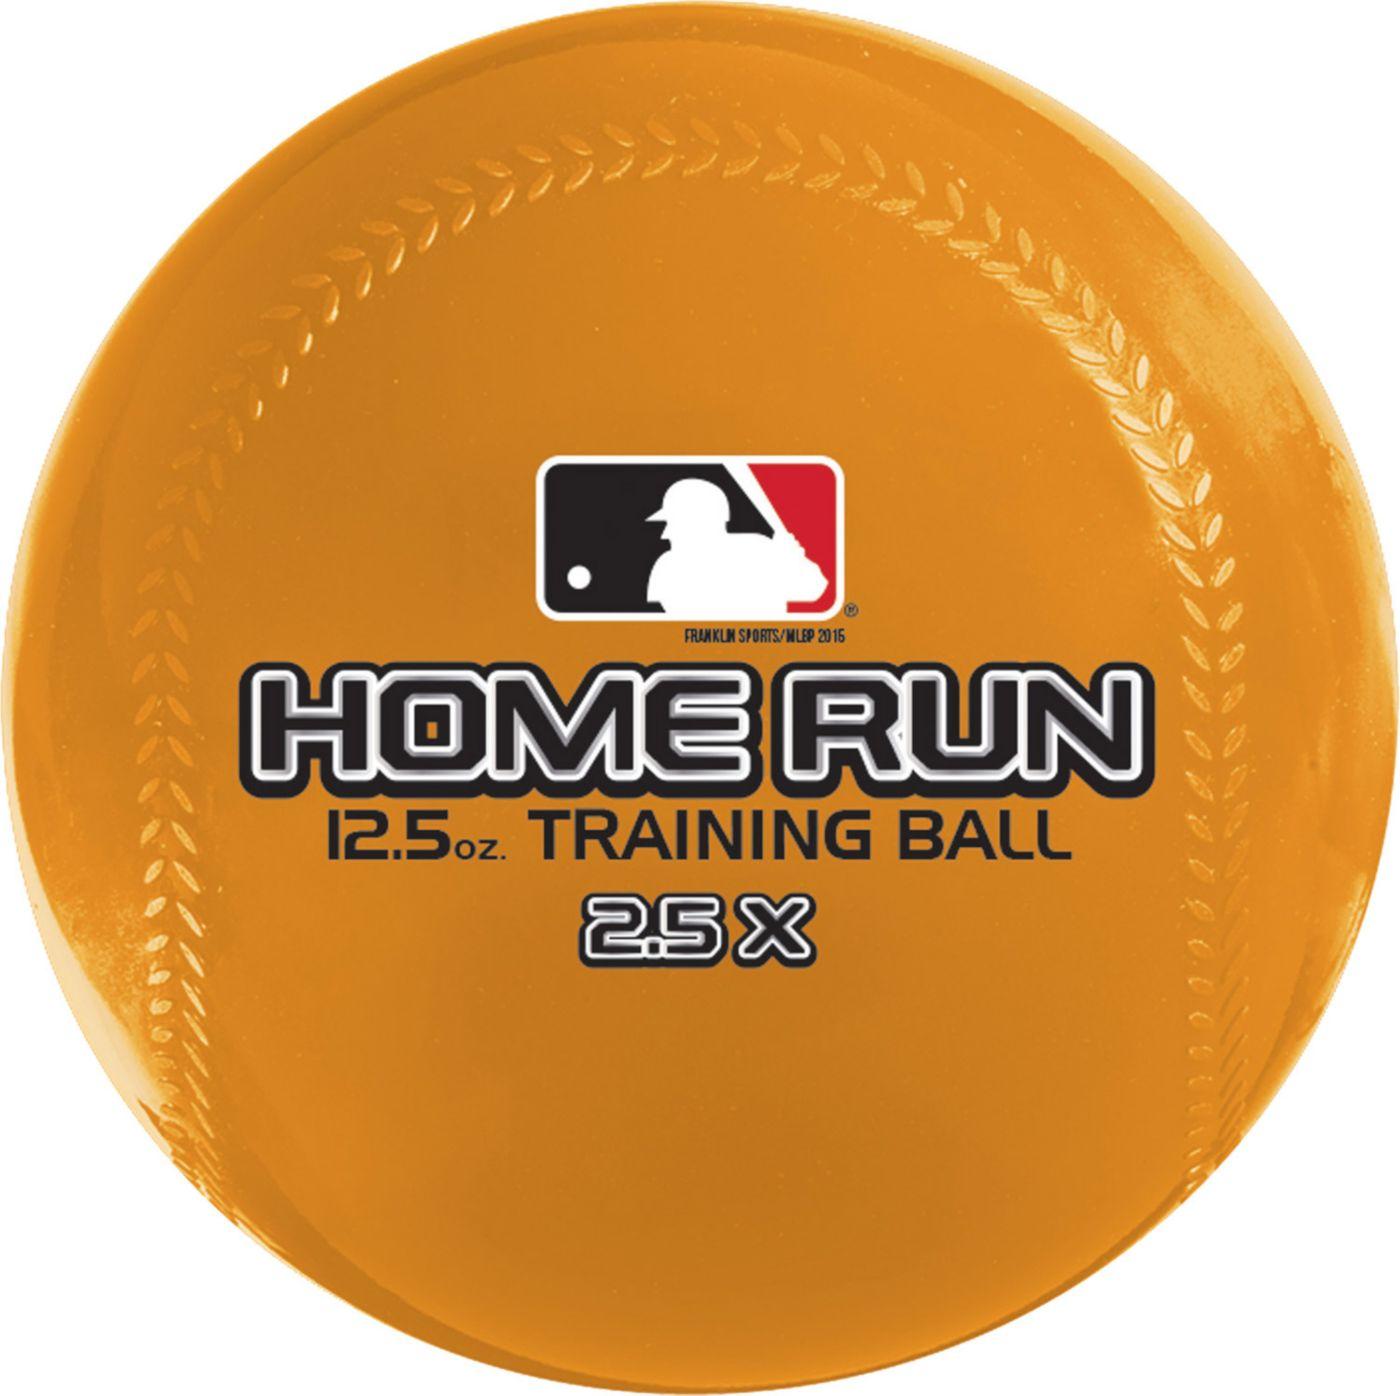 Franklin 12.5 oz. Home Run Training Balls – 6 Pack